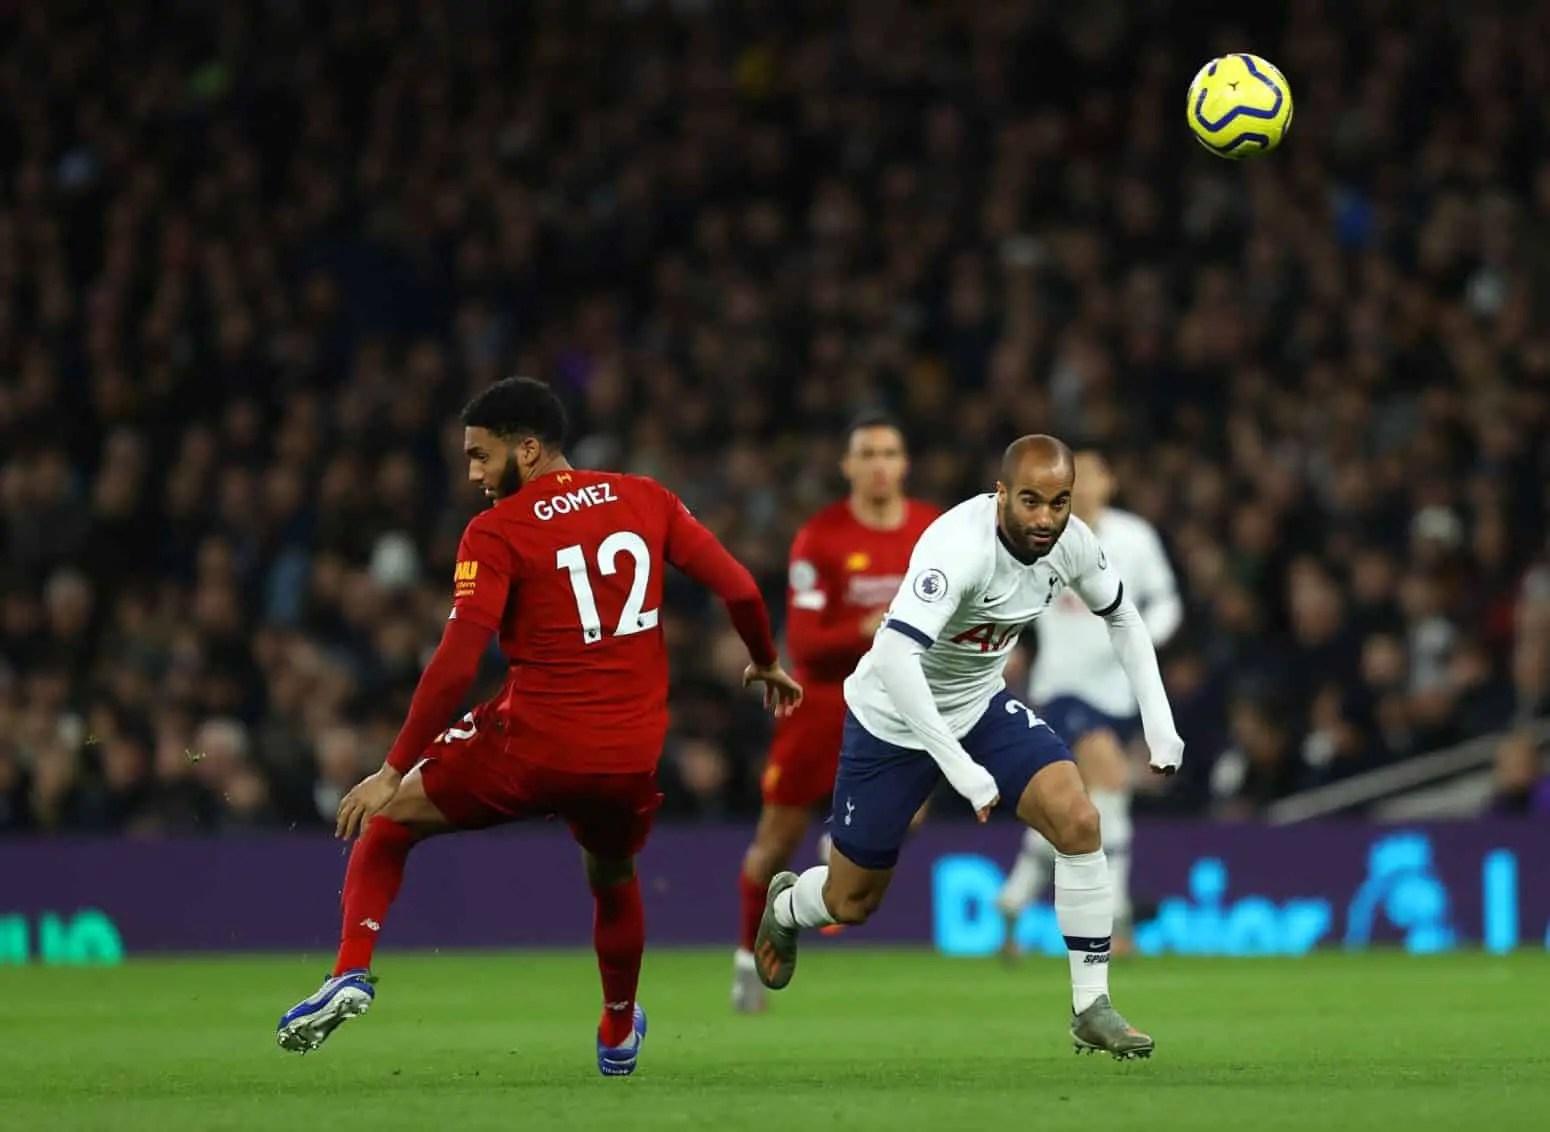 Tottenham Hotspur 0-1 Liverpool – As it happened & reaction